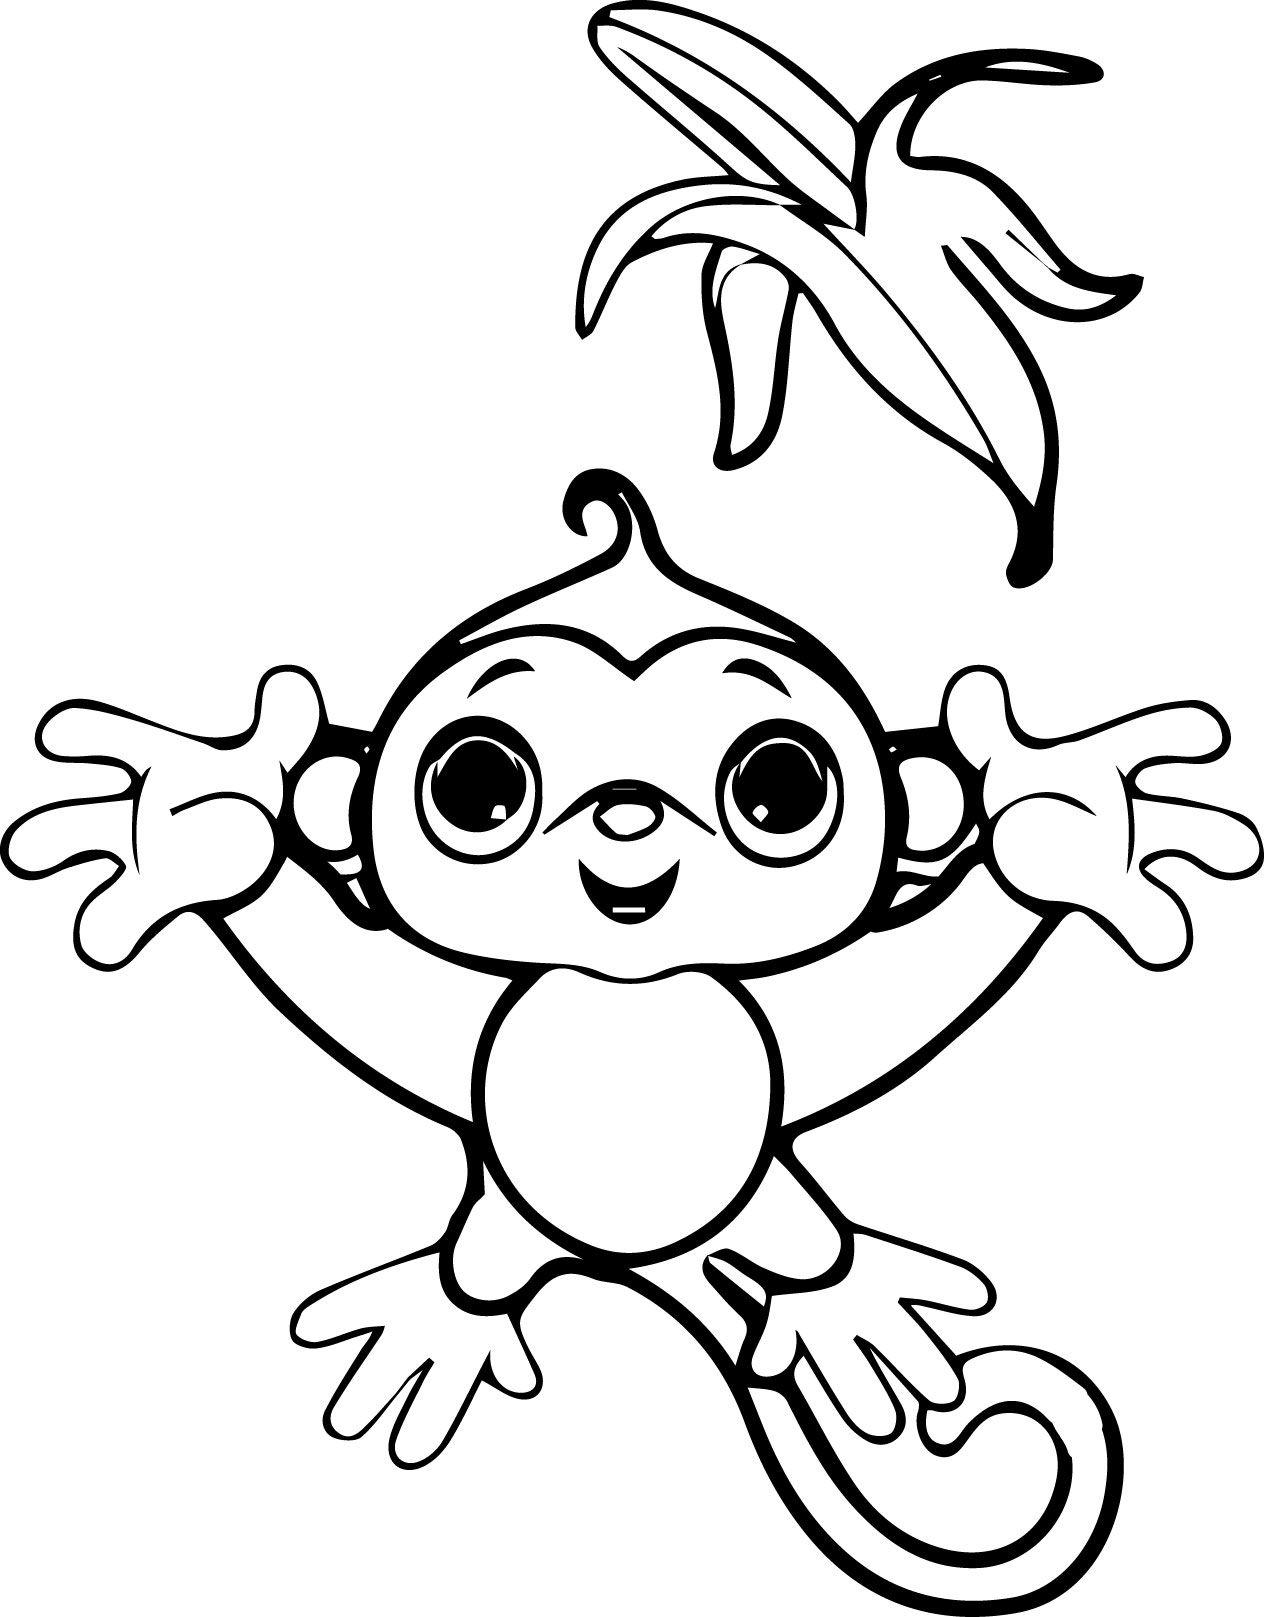 Kids Monkey Coloring Page Wecoloringpage